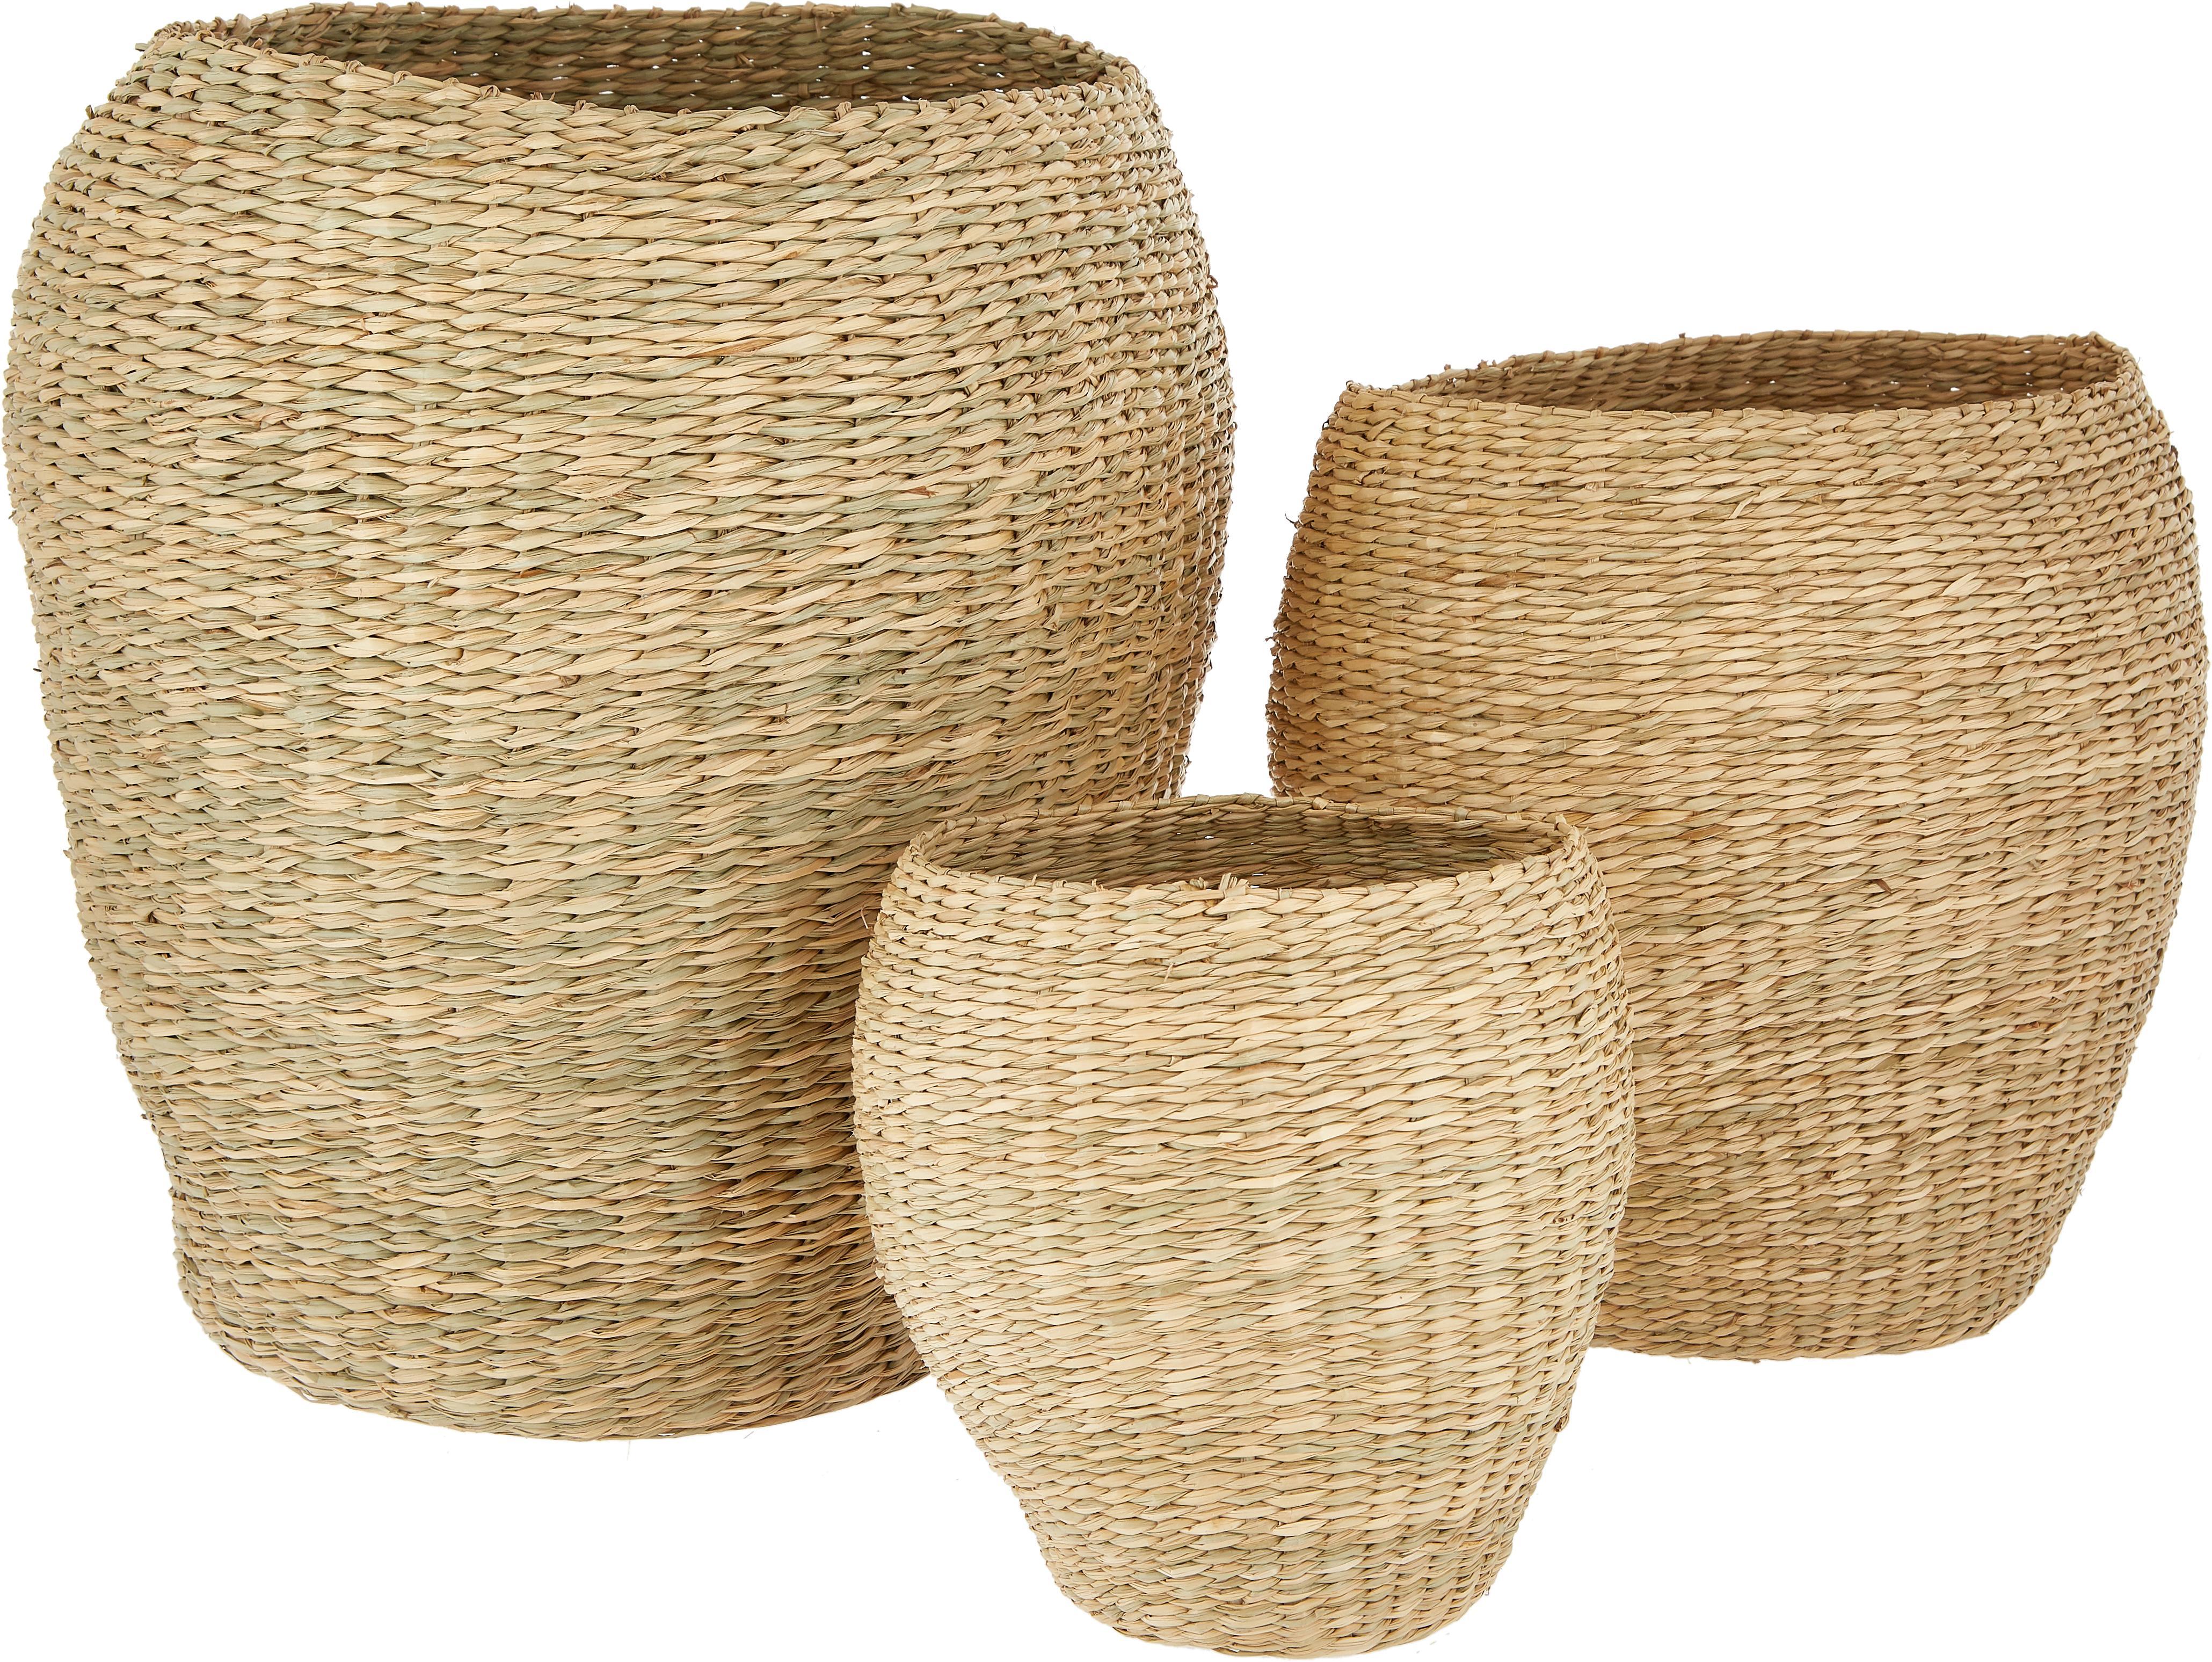 Set de cestas Oliver, 3pzas., Junco marino, tejido, Algas marinas, Set de diferentes tamaños